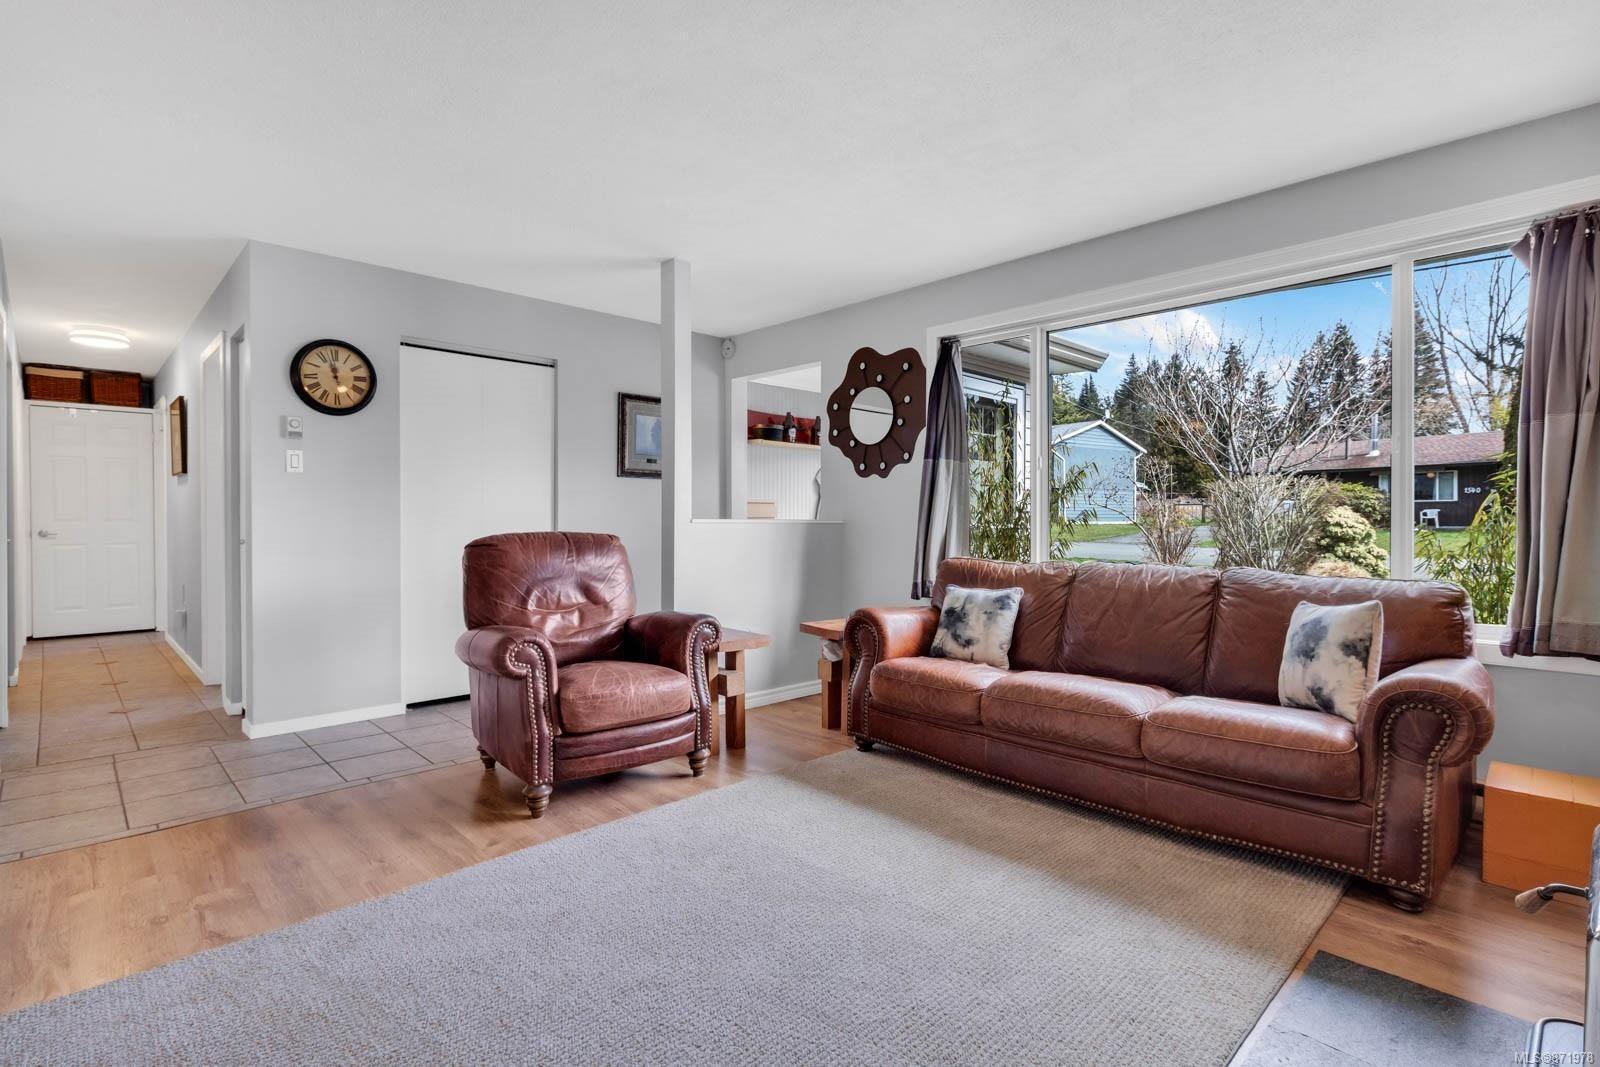 Photo 11: Photos: 1539 Chilcotin Cres in : CV Comox (Town of) House for sale (Comox Valley)  : MLS®# 871978